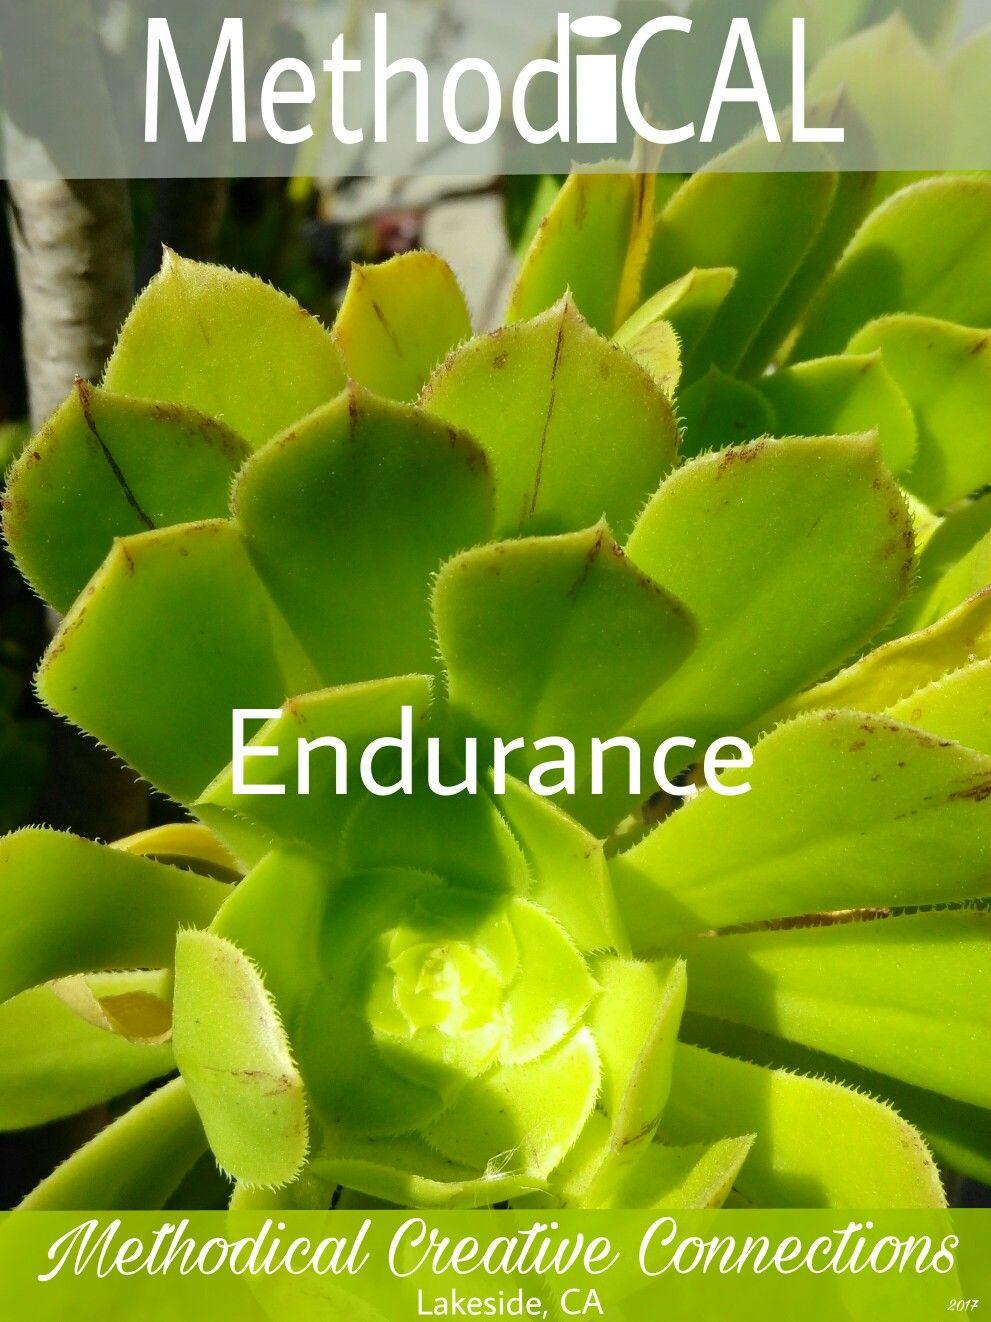 Endurance #Method_iCAL #endurance